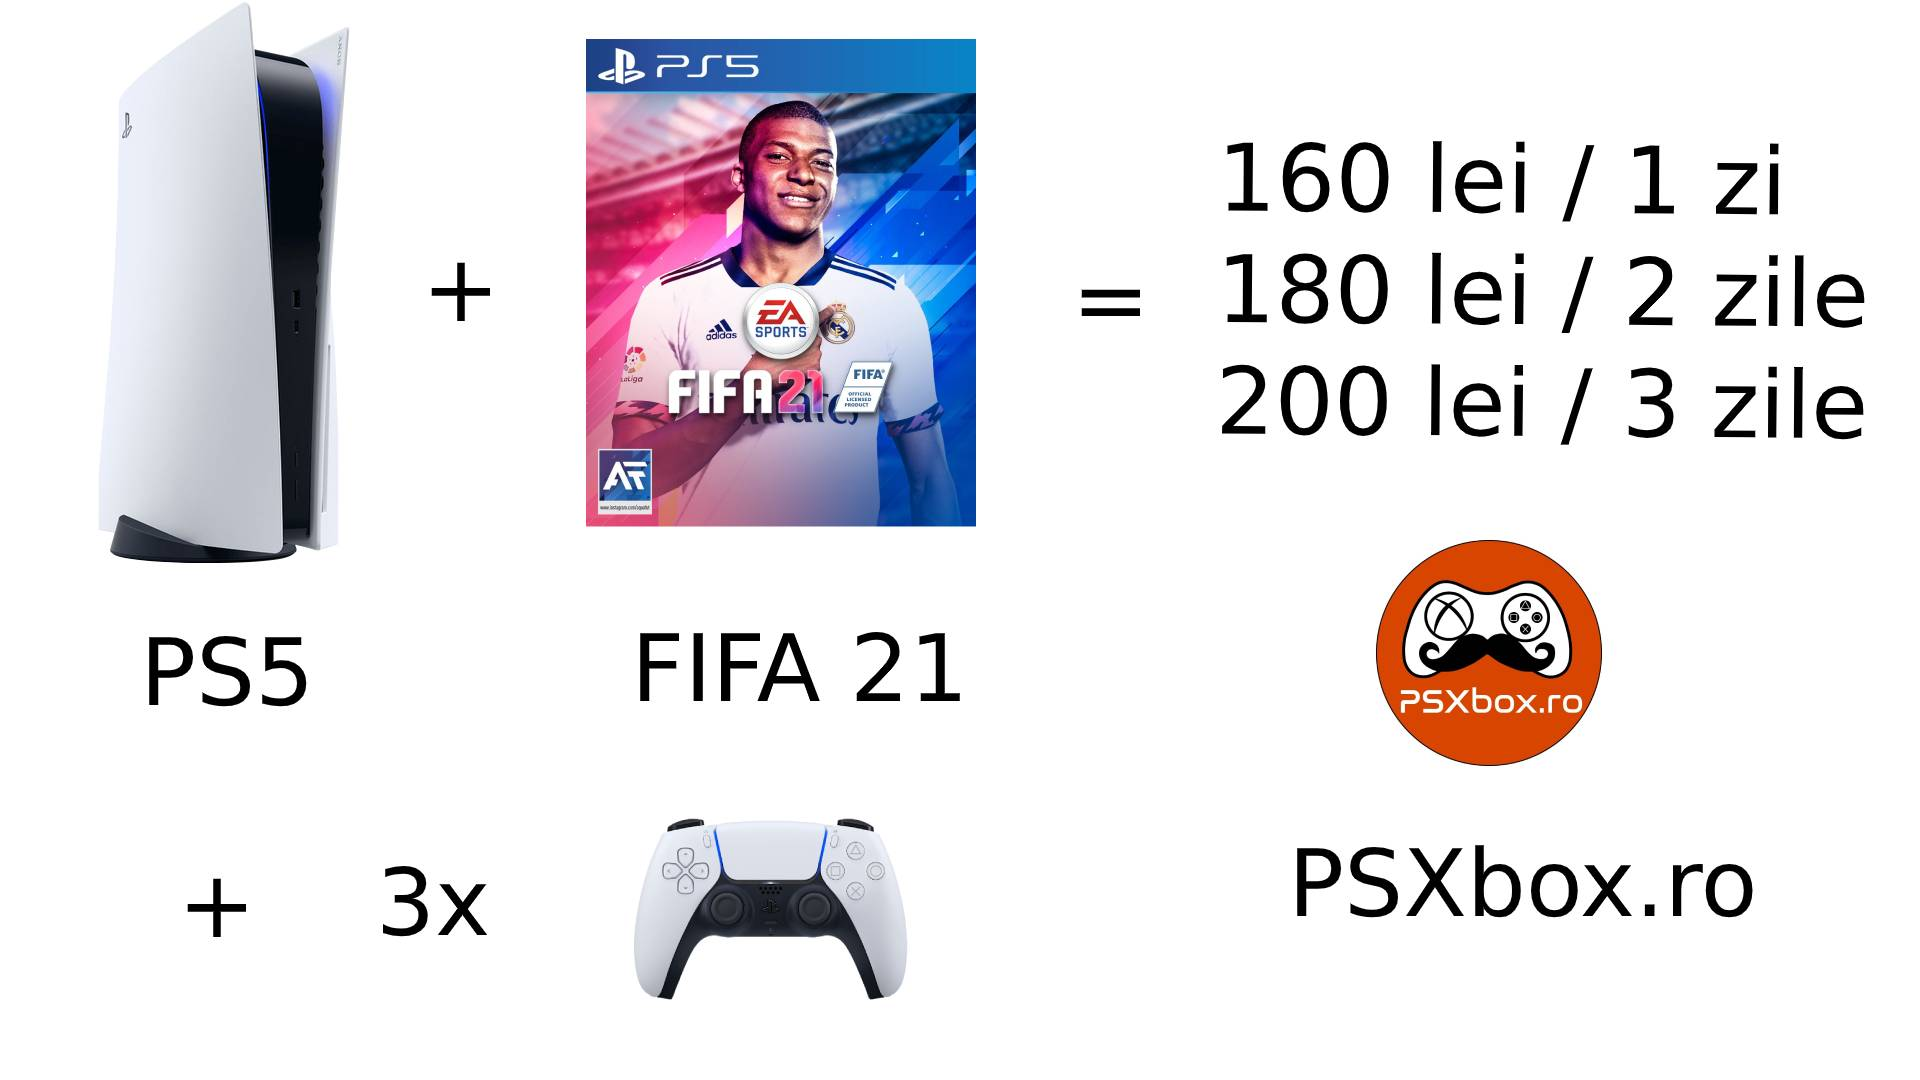 Pachet Inchiriere Fifa 21 PS5 psxbox, inchiriere console jocuri video PlayStation 5 & Xbox Series X